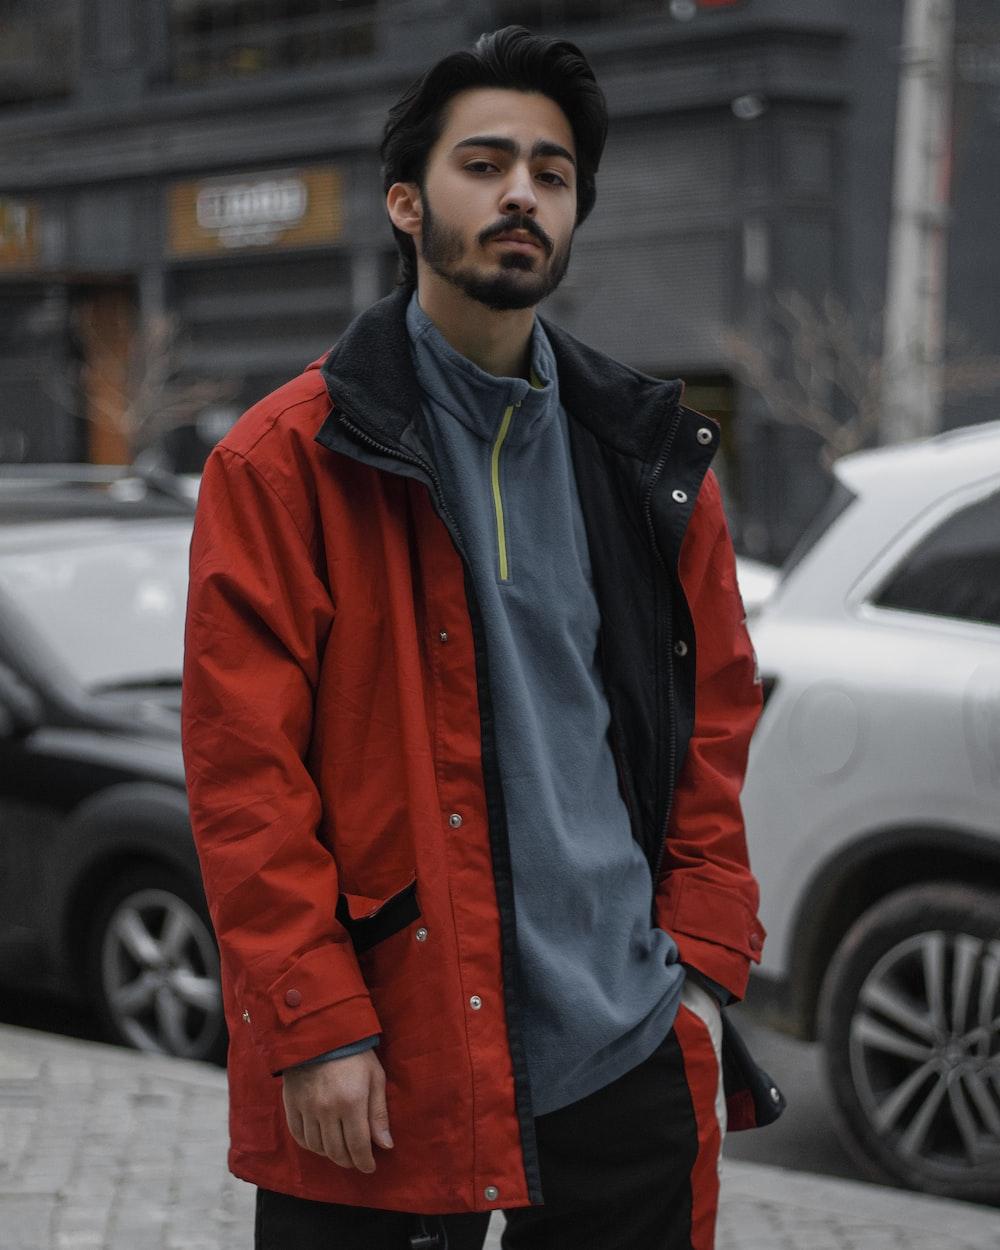 man in red jacket standing near black car during daytime